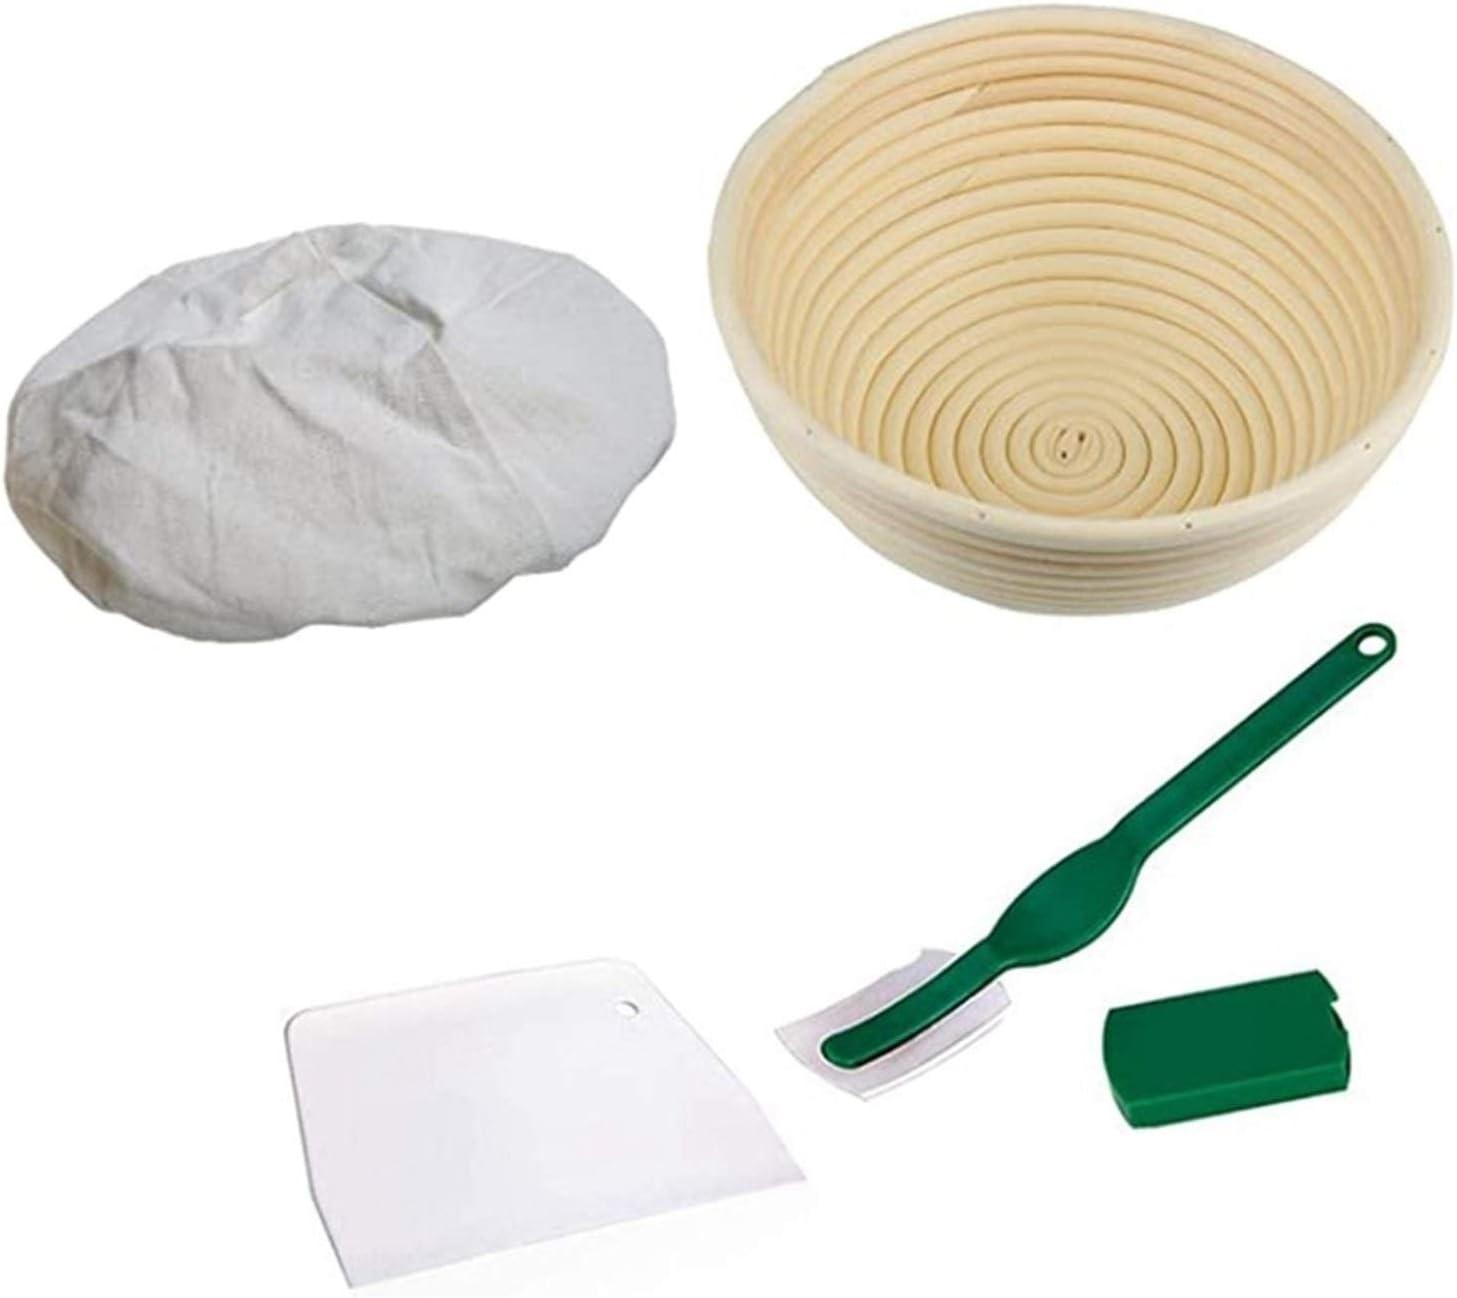 YWSZY Bread Proofing Regular discount Baskets 9-inch Basket Financial sales sale Neisuo